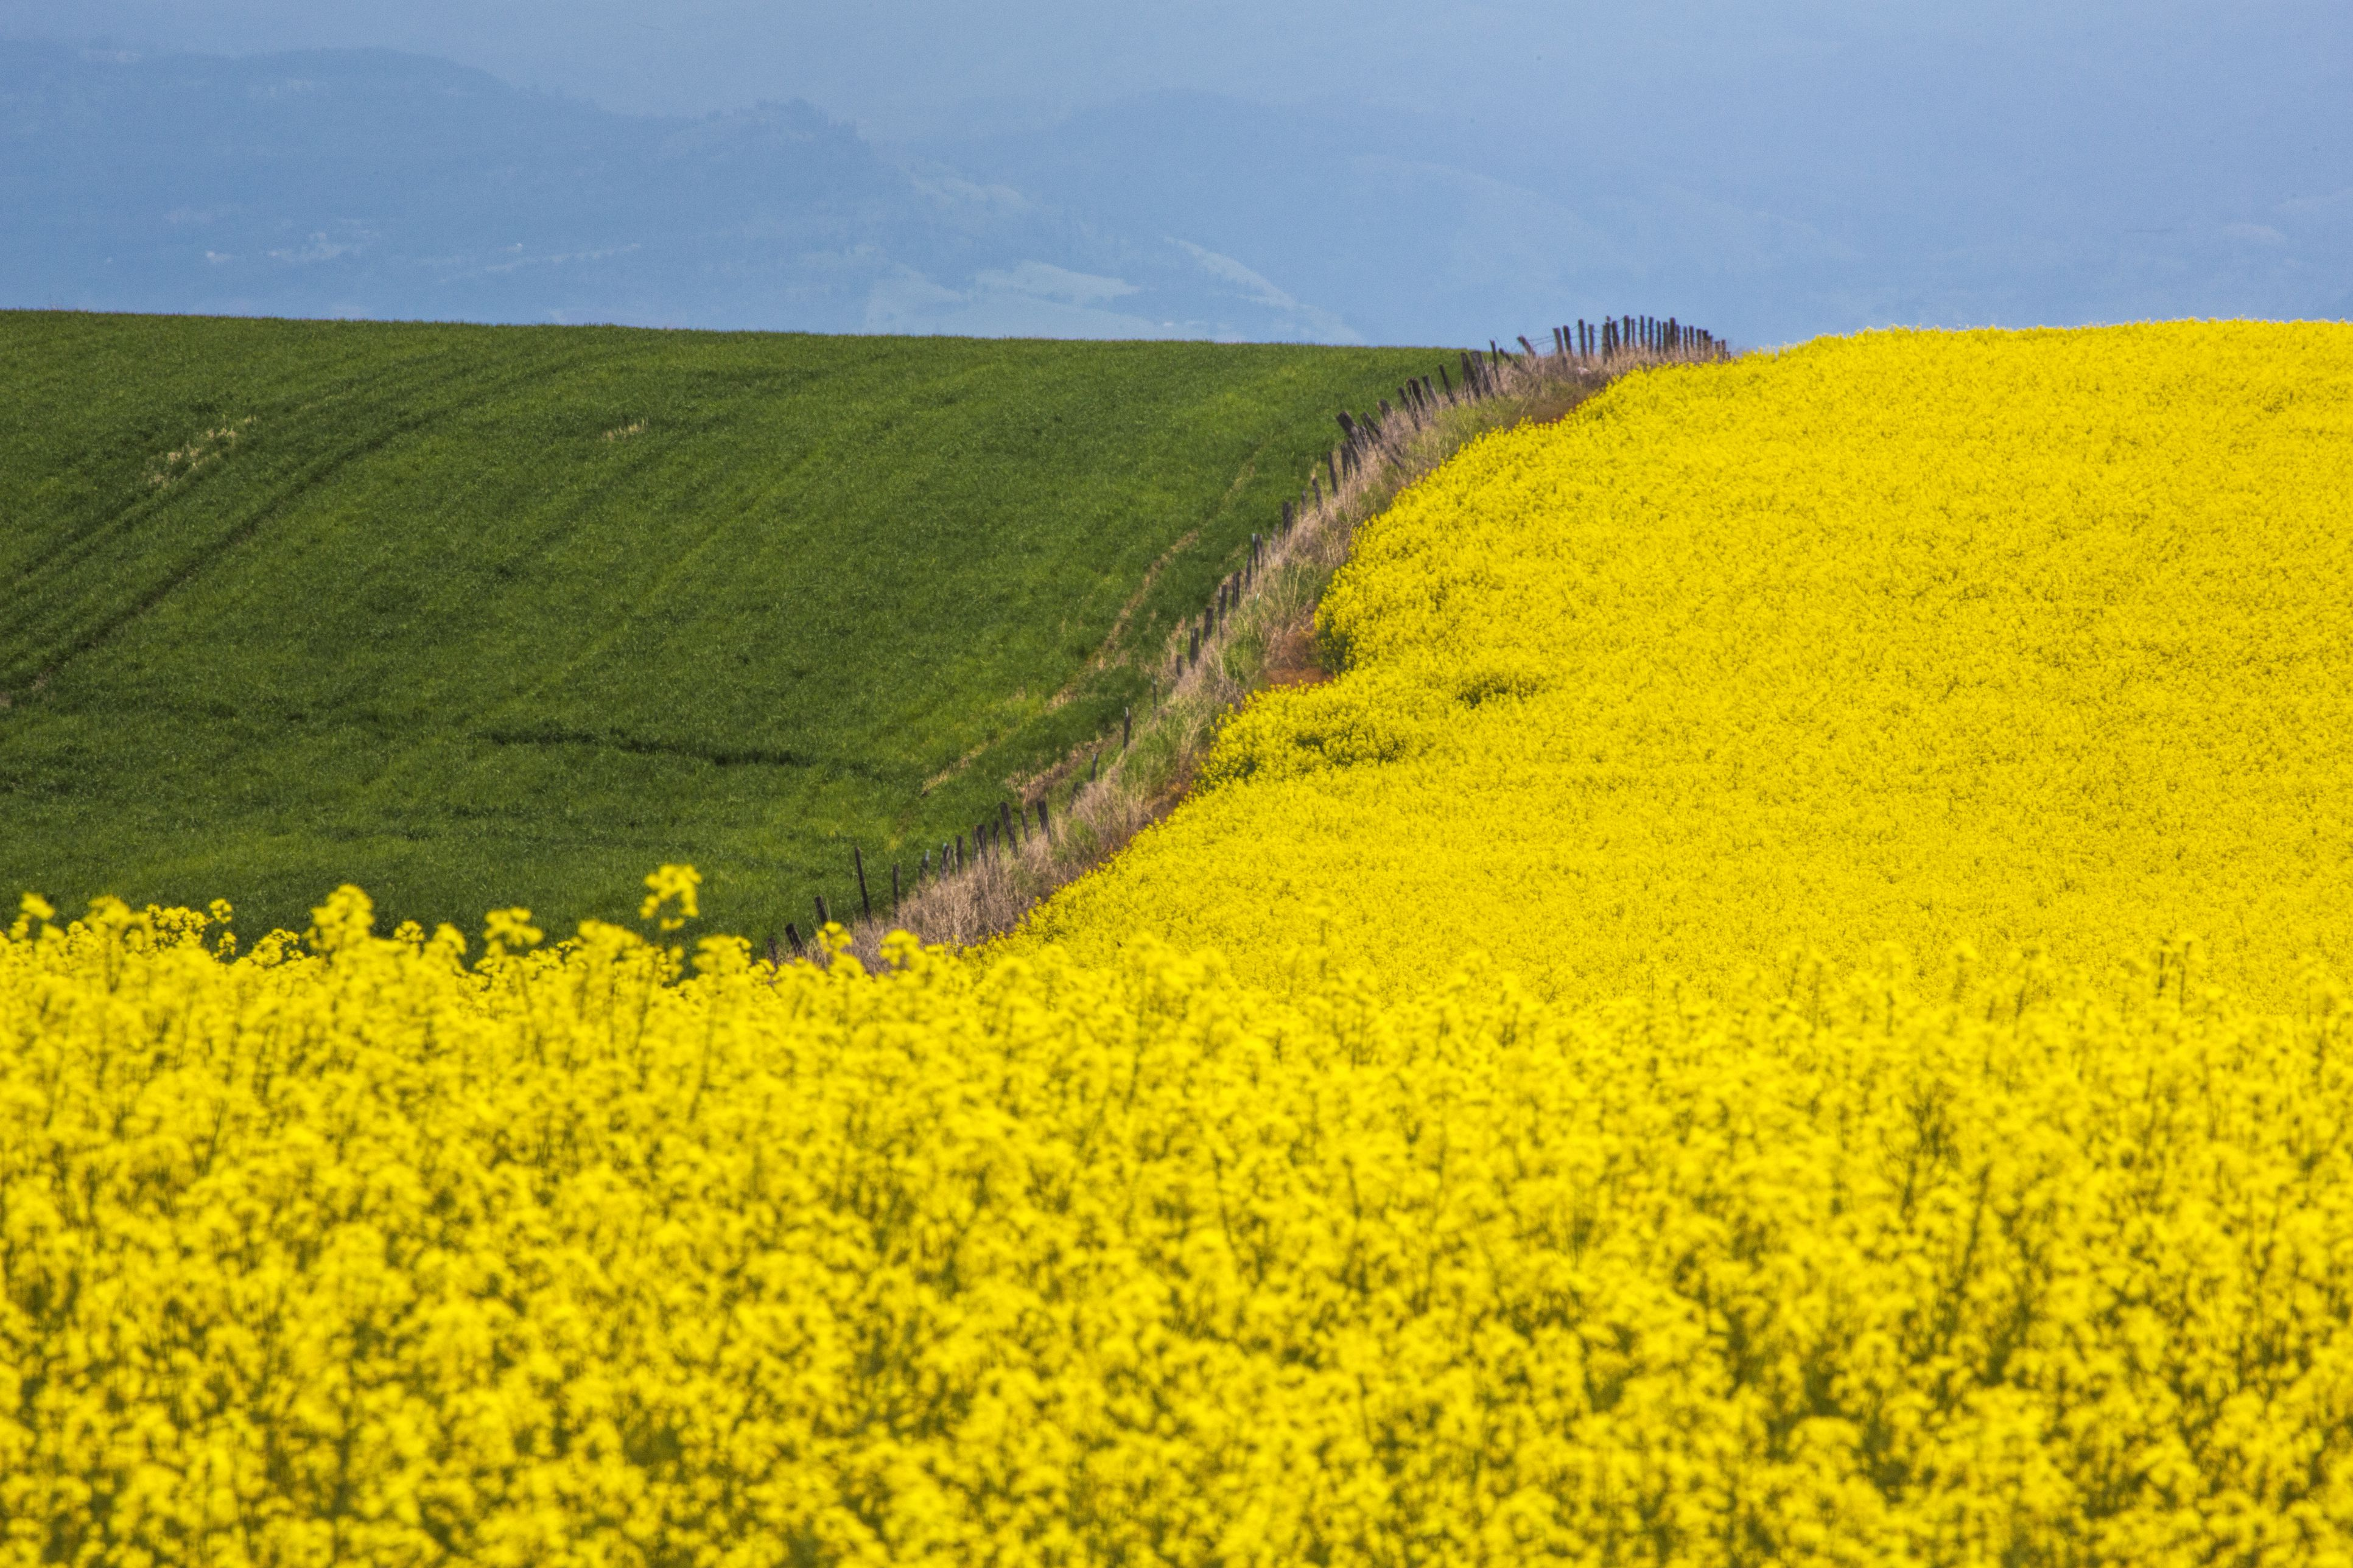 Canola Field in Full Fresh Bloom Along fence, Grangeville, Idaho, USA